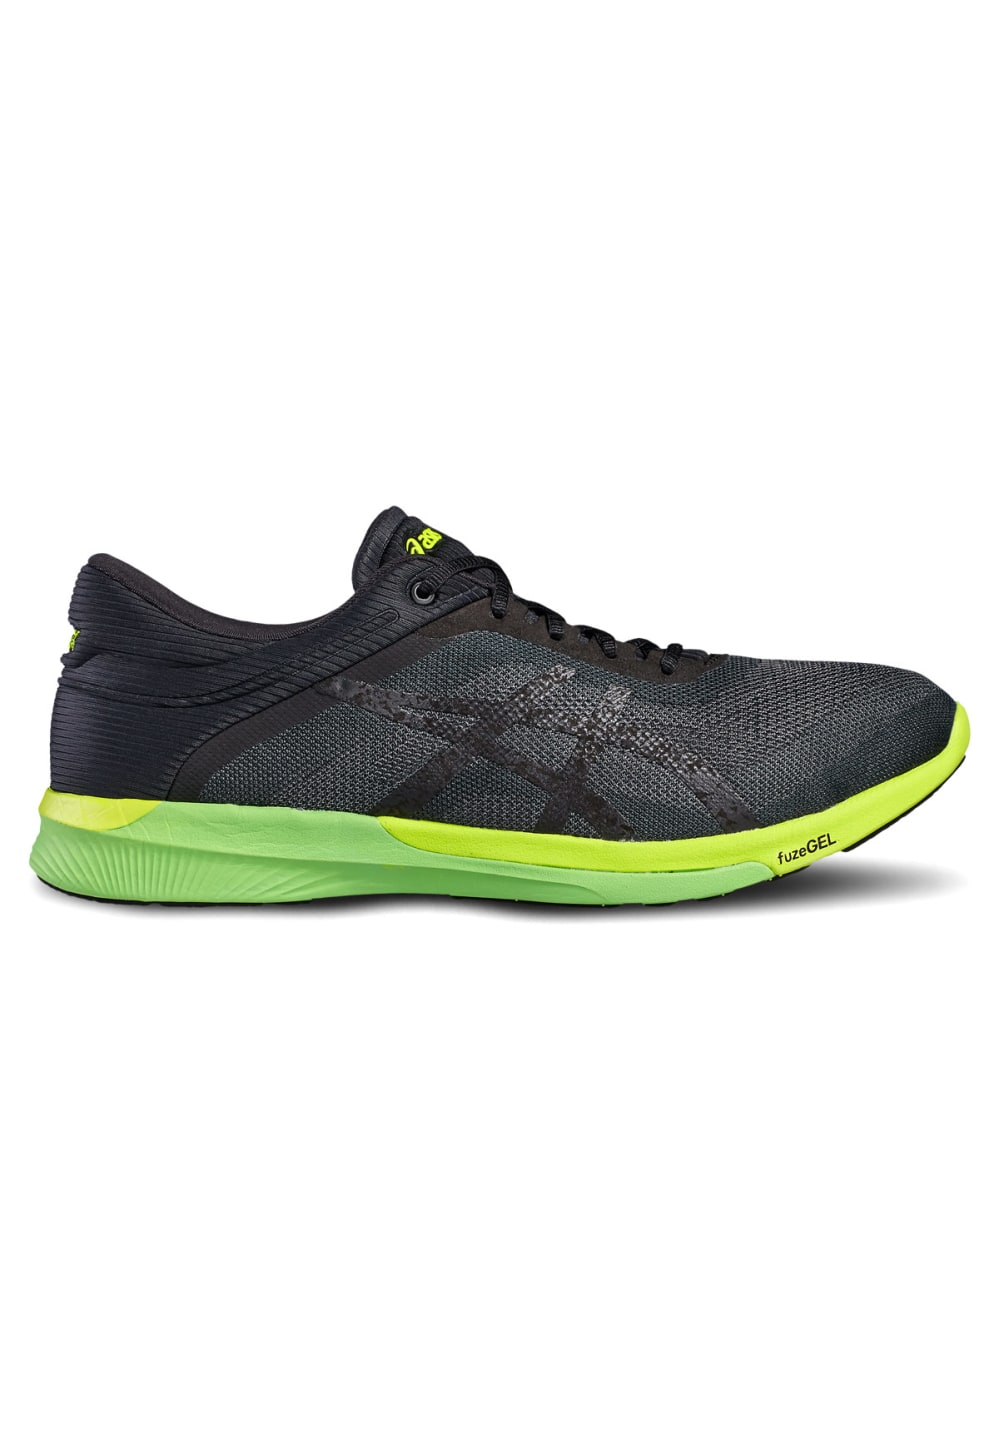 nouveau concept e9f3c 3ef21 ASICS fuzeX Rush - Running shoes for Men - Black